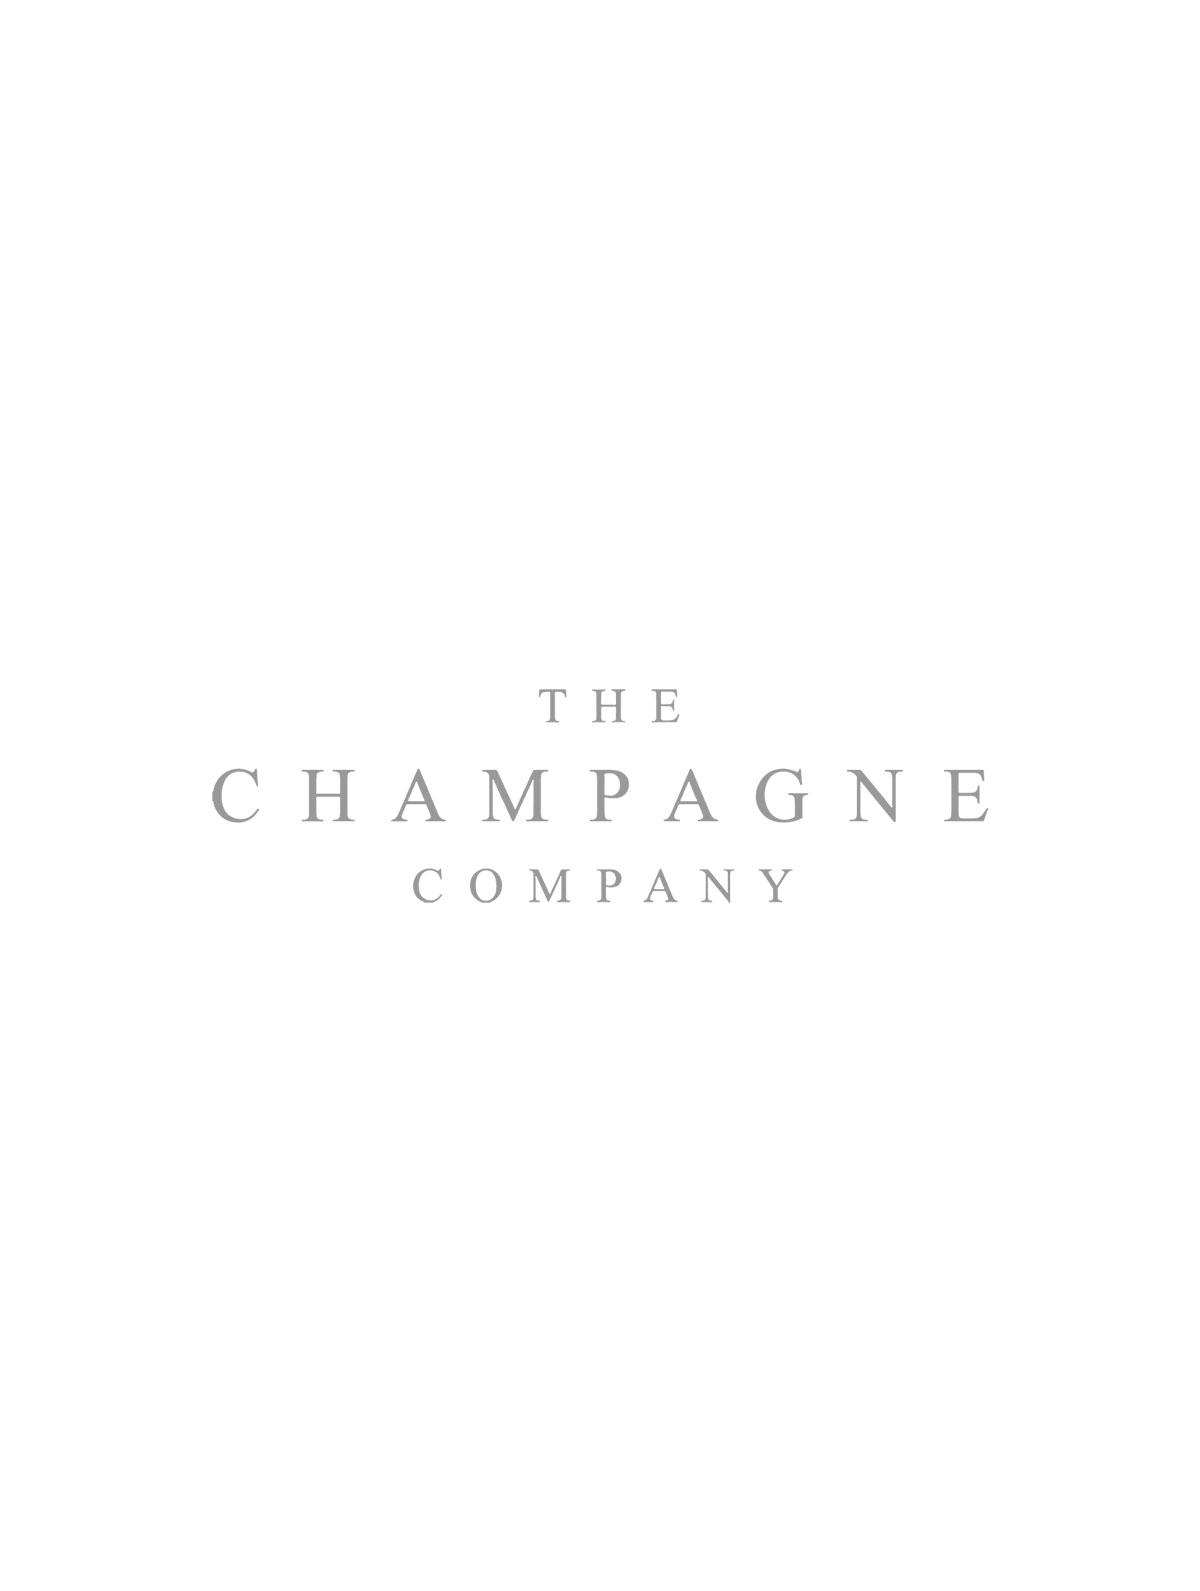 Louis Roederer 2002 Cristal Champagne Methuselah 600cl